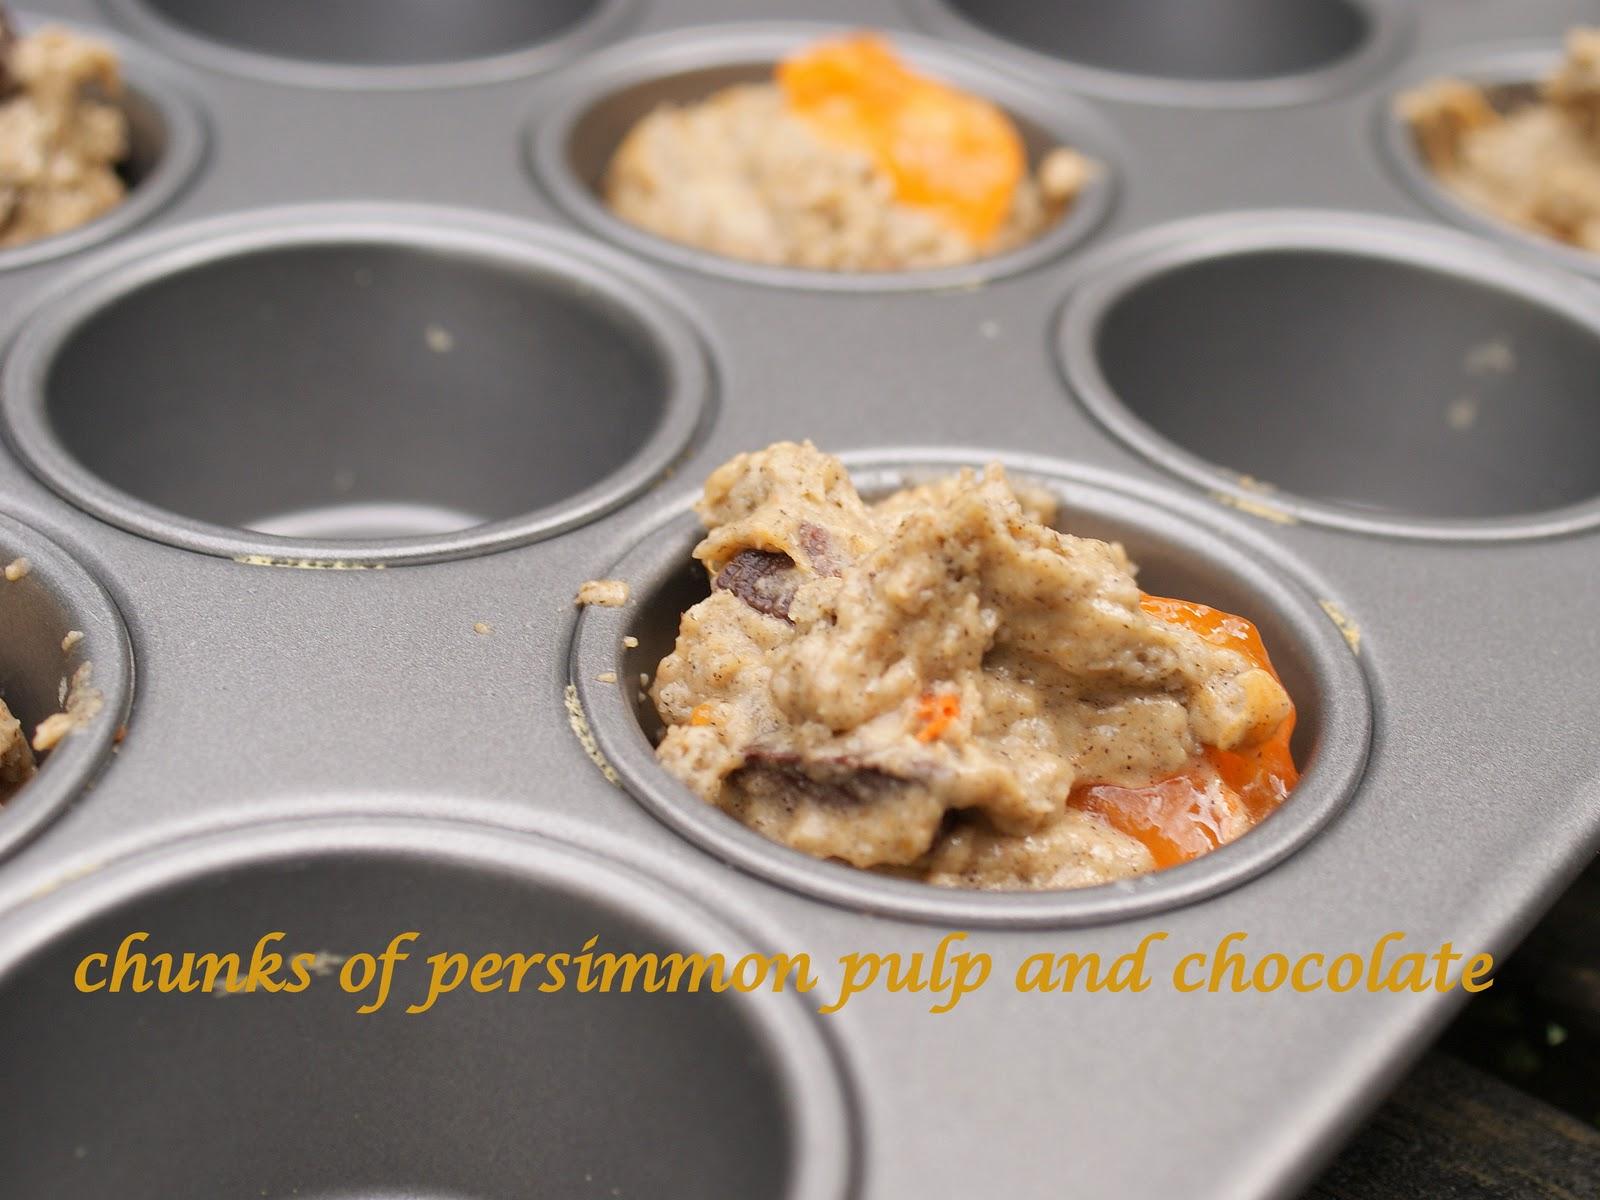 Chocolate Persimmon Muffin Recipe